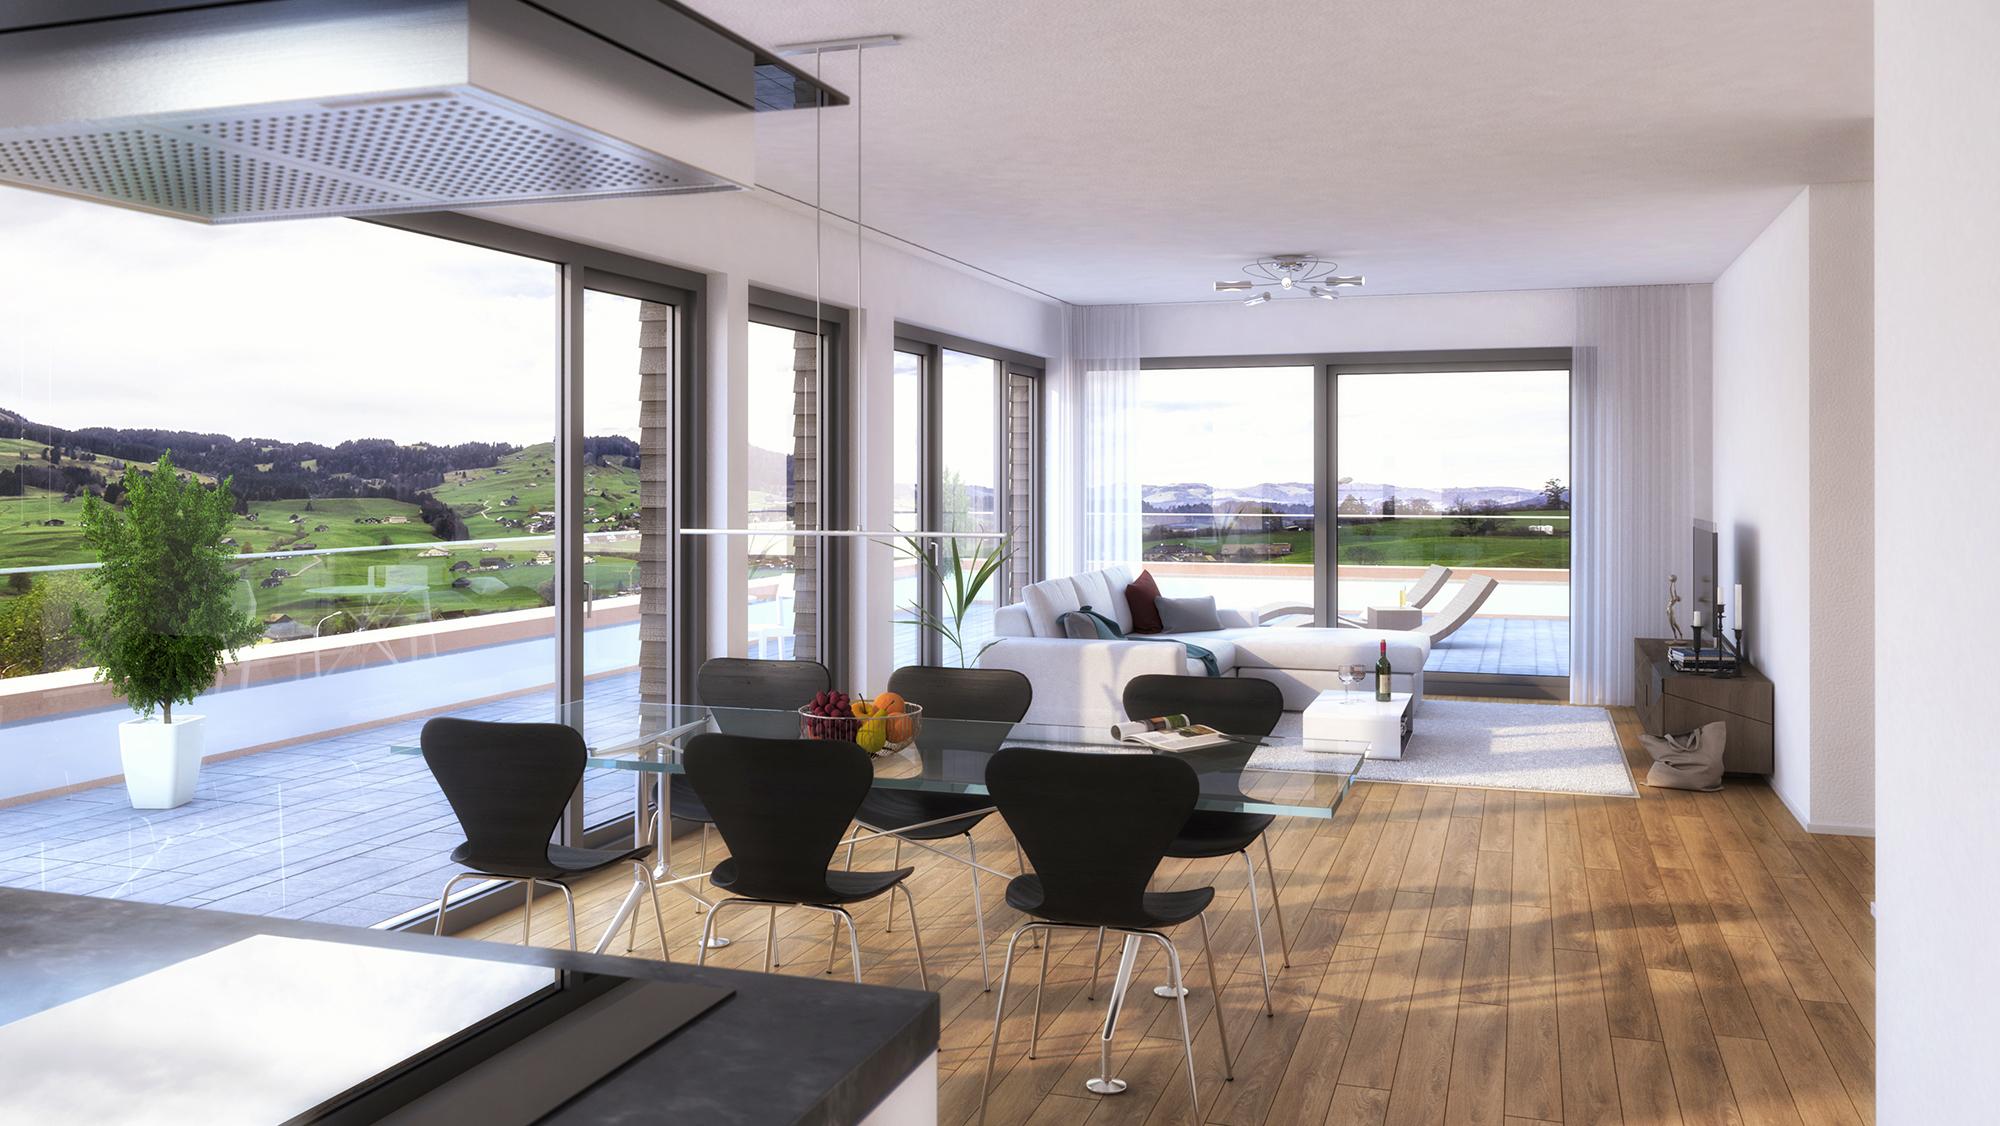 Anjana Perera Visualisierung - Wohnbebauung in Uzwil  - D+D Projekt Consult AG